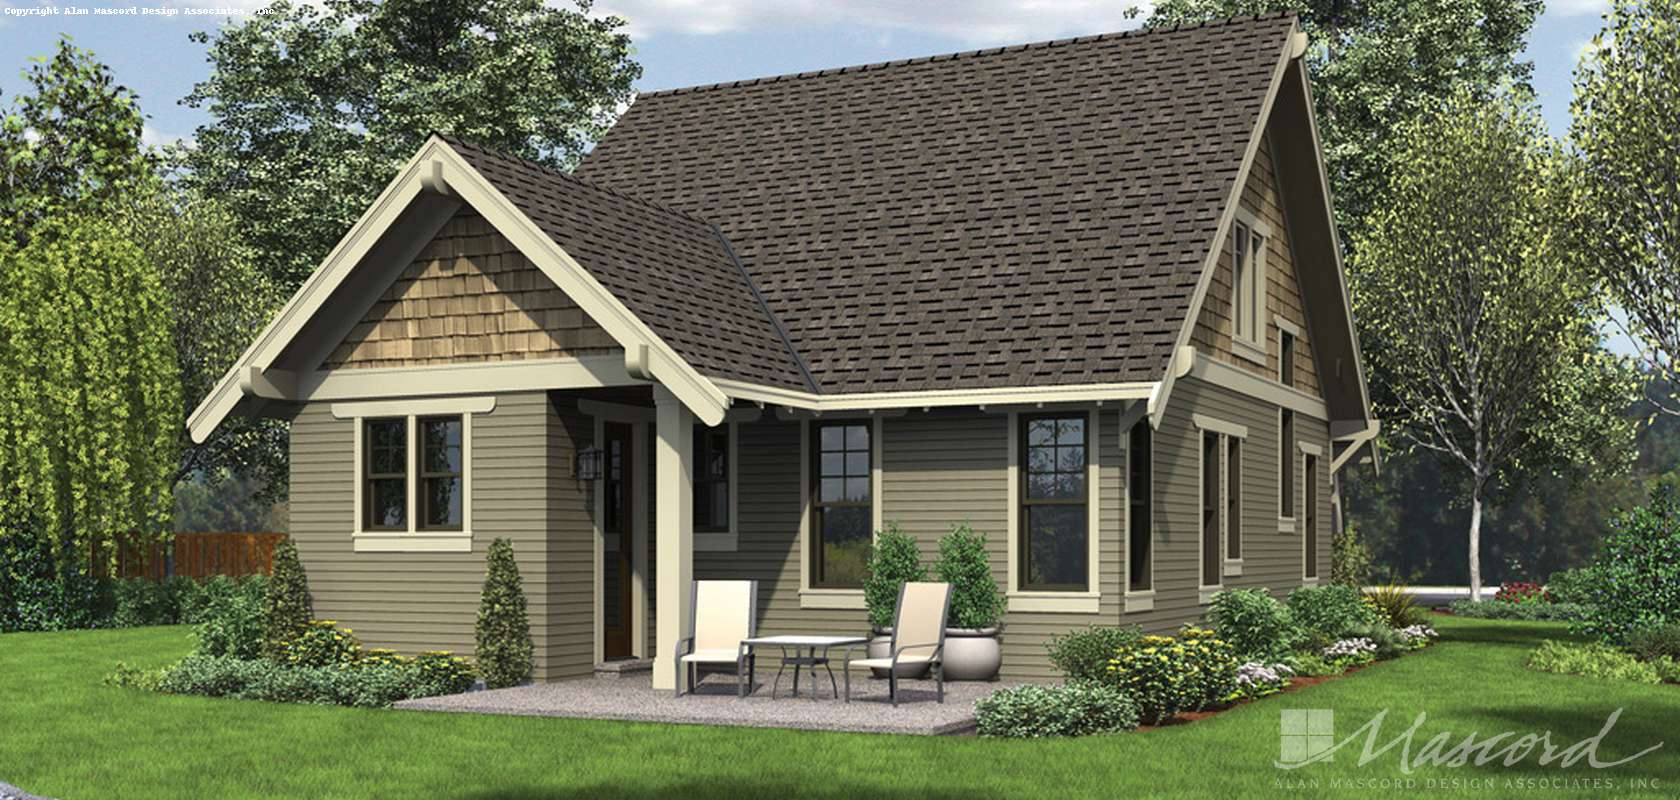 Mascord House Plan 21145: The Morris